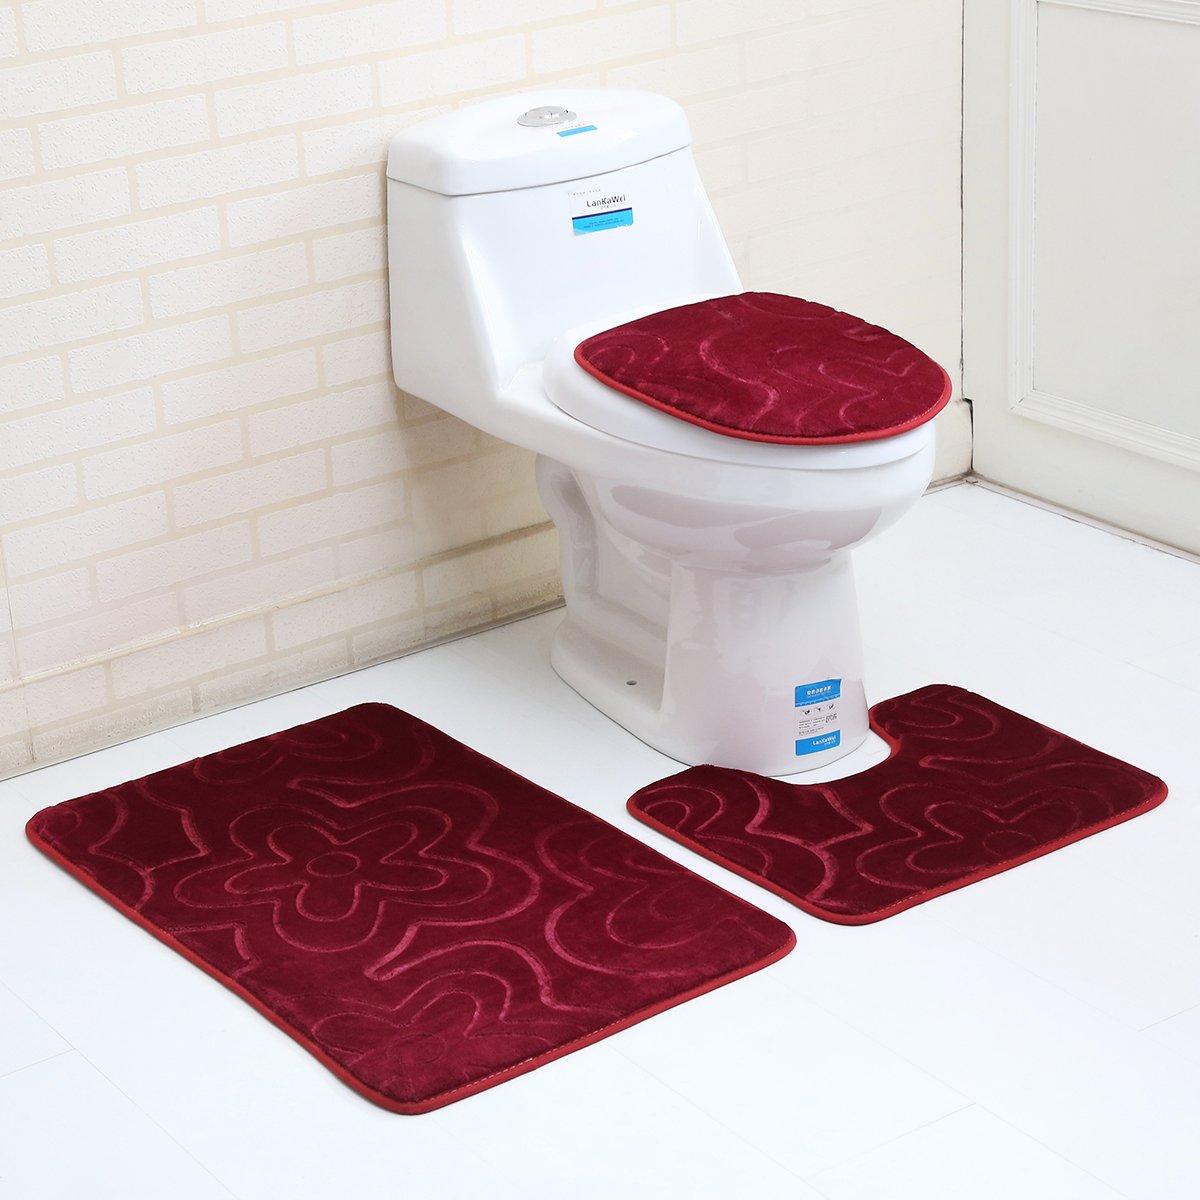 "3PC Bath Mat Rug Set Bathroom Non-Slip Floor Mat Flannel Pedestal Rug(15.7""x19.7"") + Lid Toilet Cover(15.7""x17.7"") + Bath Mat Makaor (19.7""x31.4"") (wine red)"